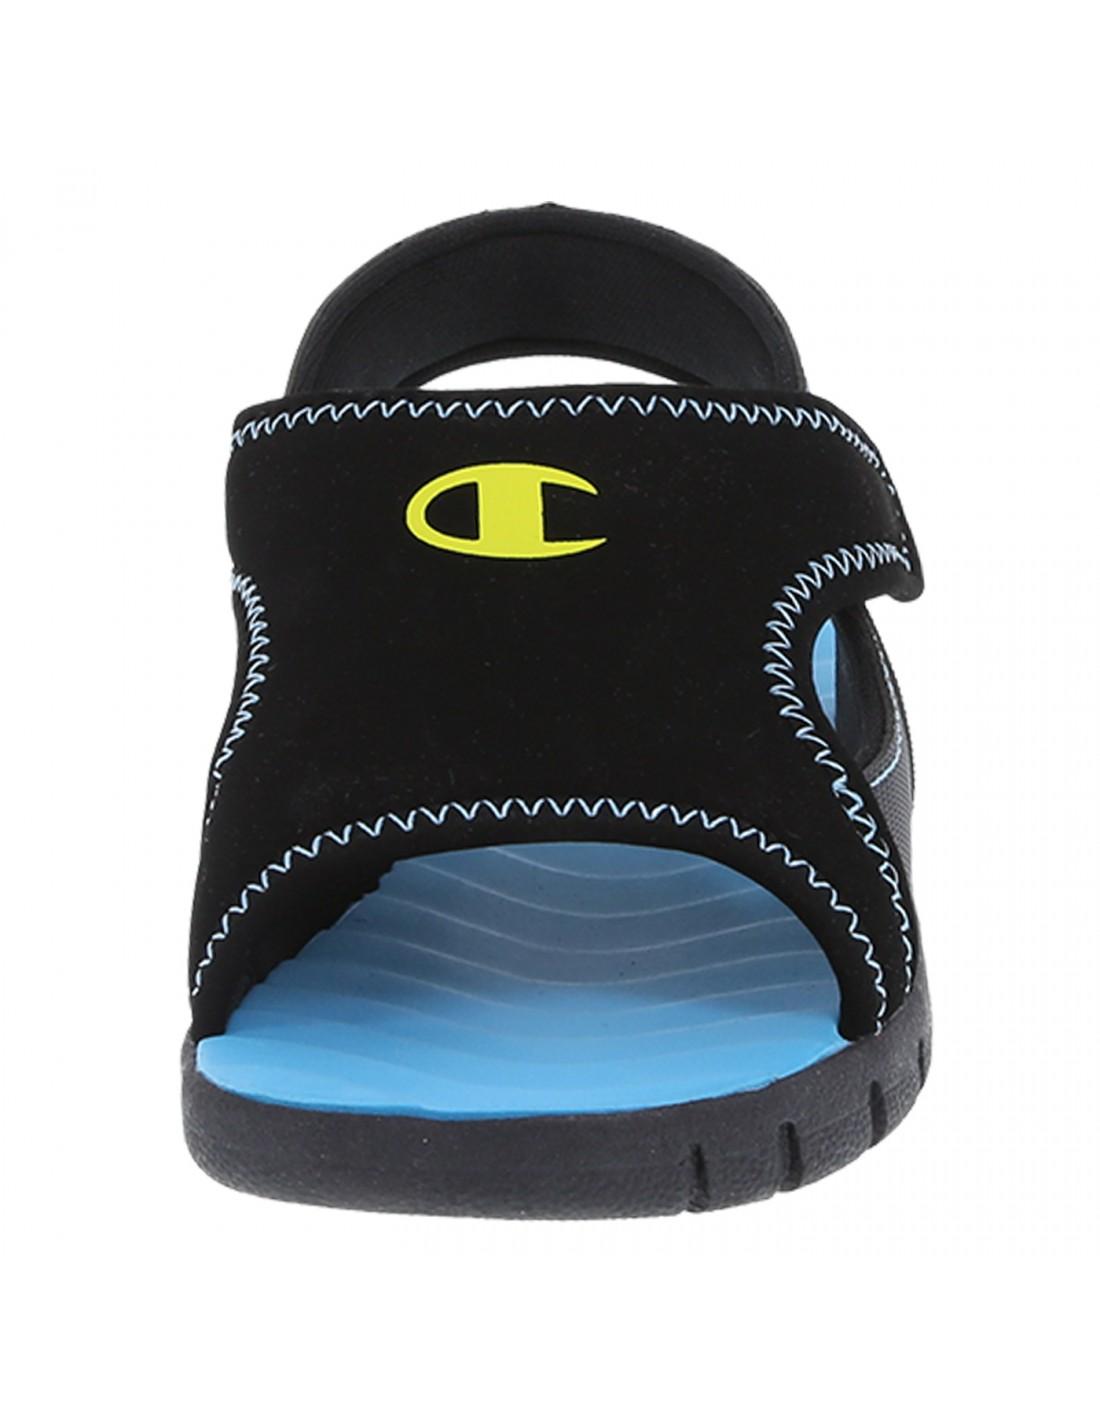 e82a662fab02 Boys  Splash Sandals. On sale!